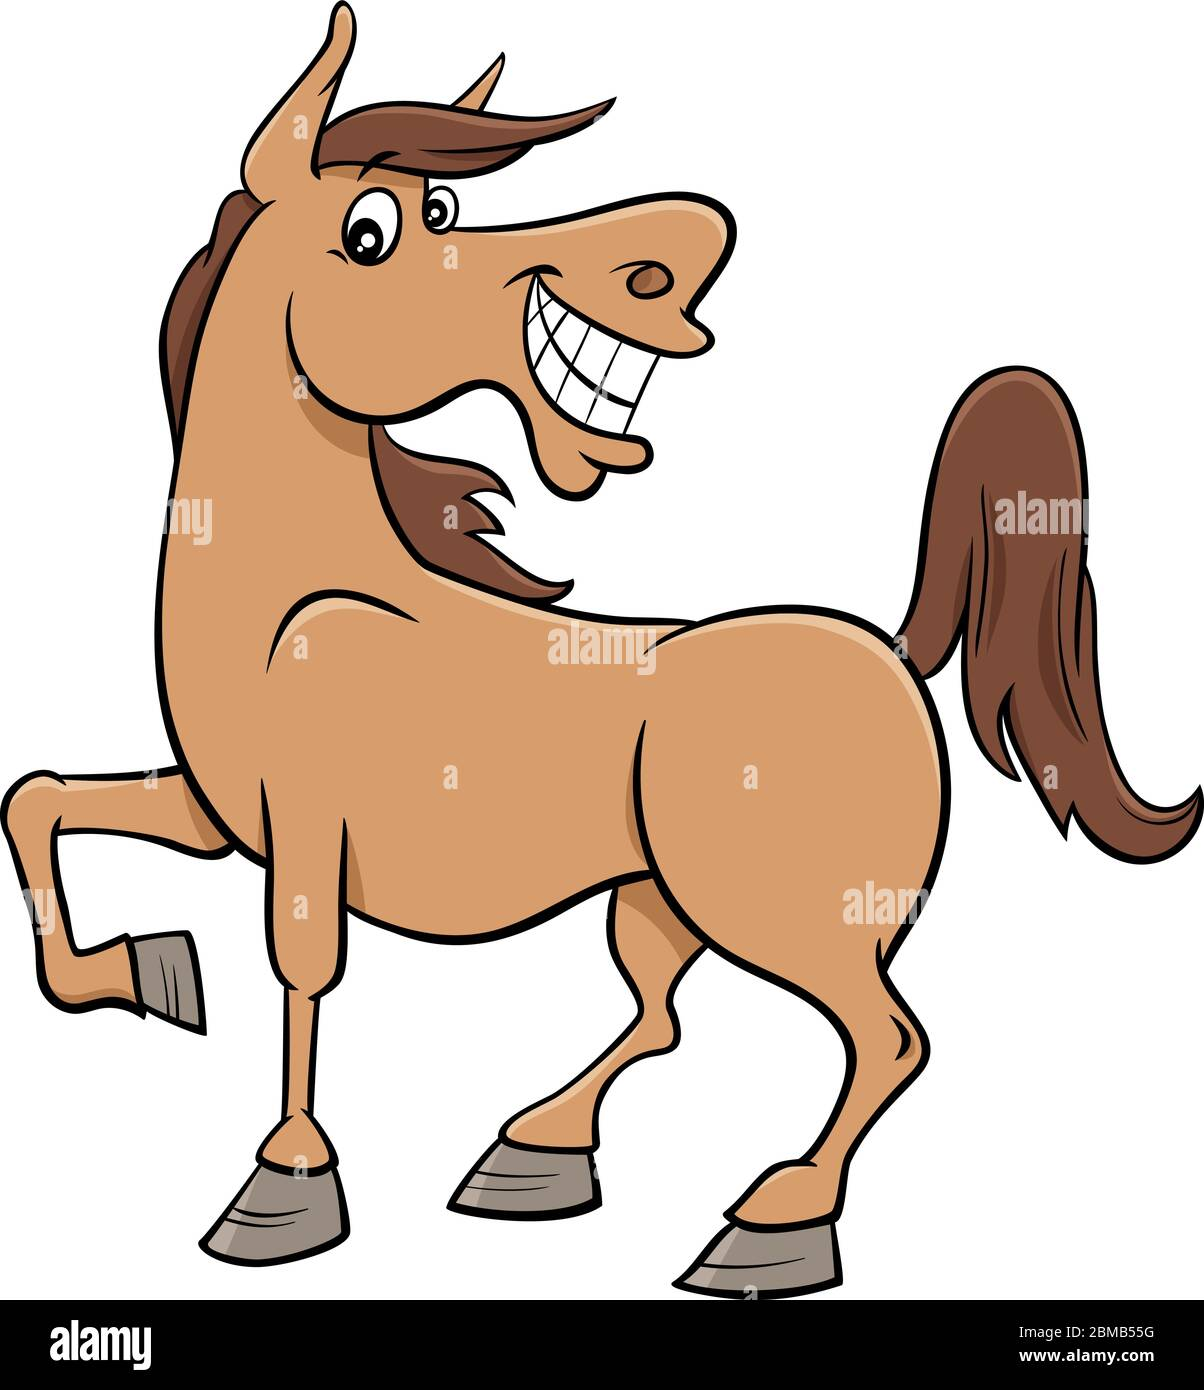 Cartoon Illustration Of Happy Horse Farm Comic Animal Character Stock Vector Image Art Alamy